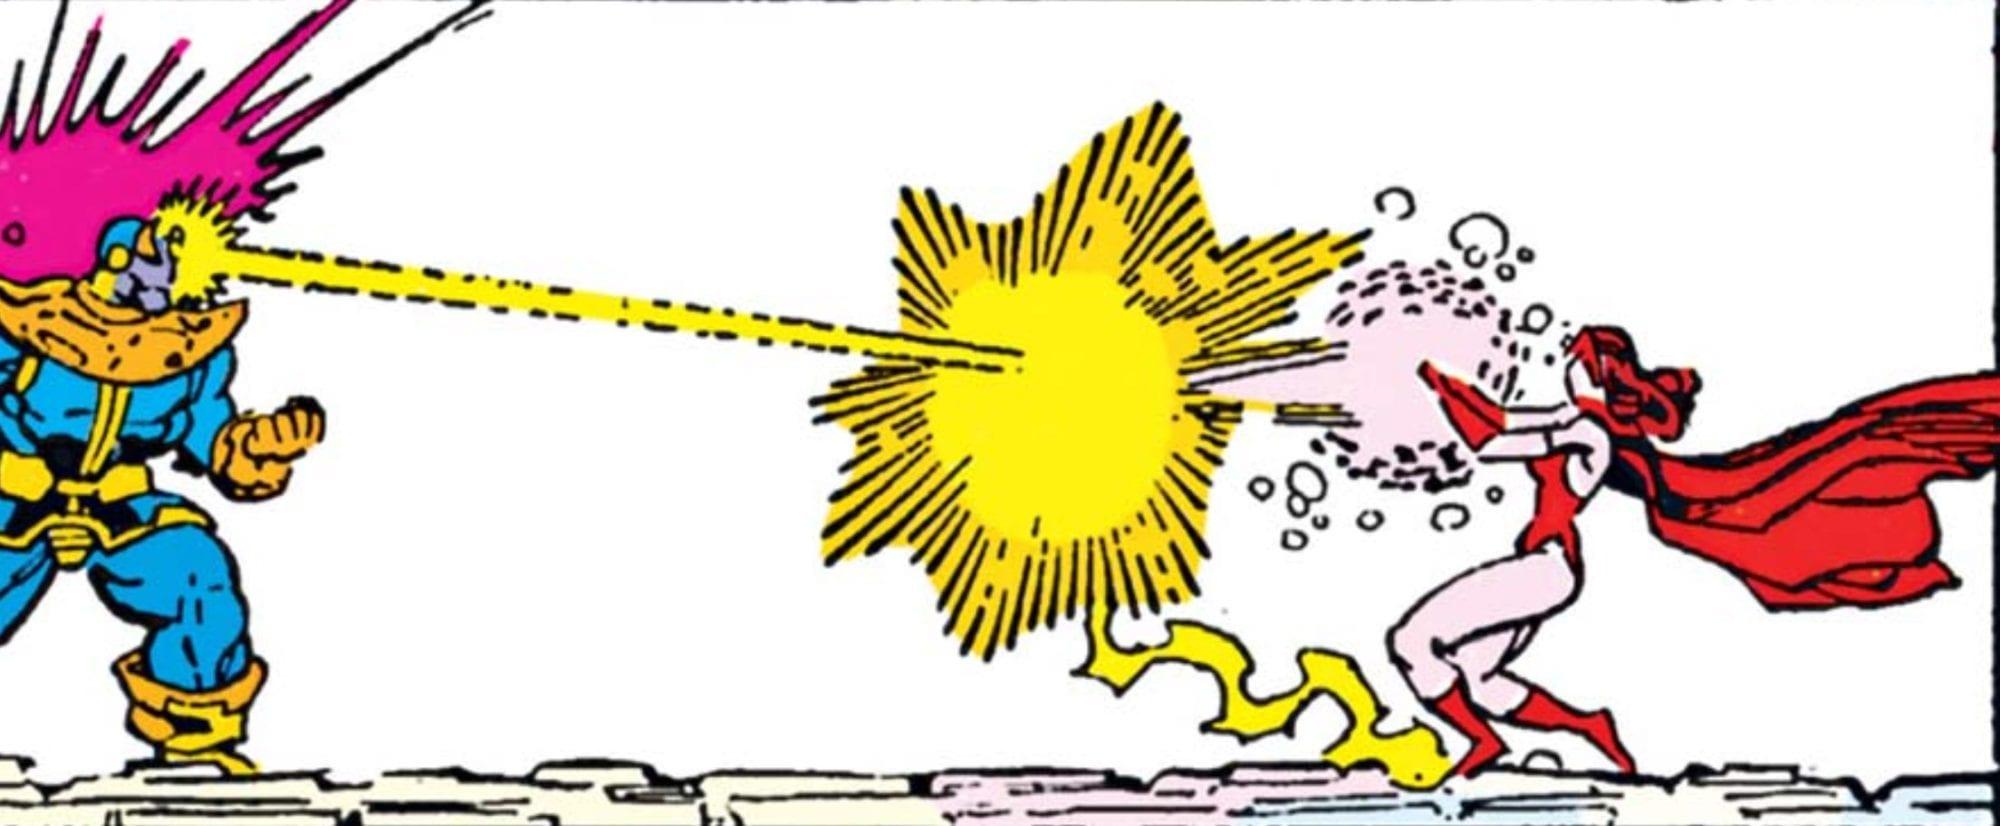 The Infinity Gauntlet #4 - Thanos vs Wanda